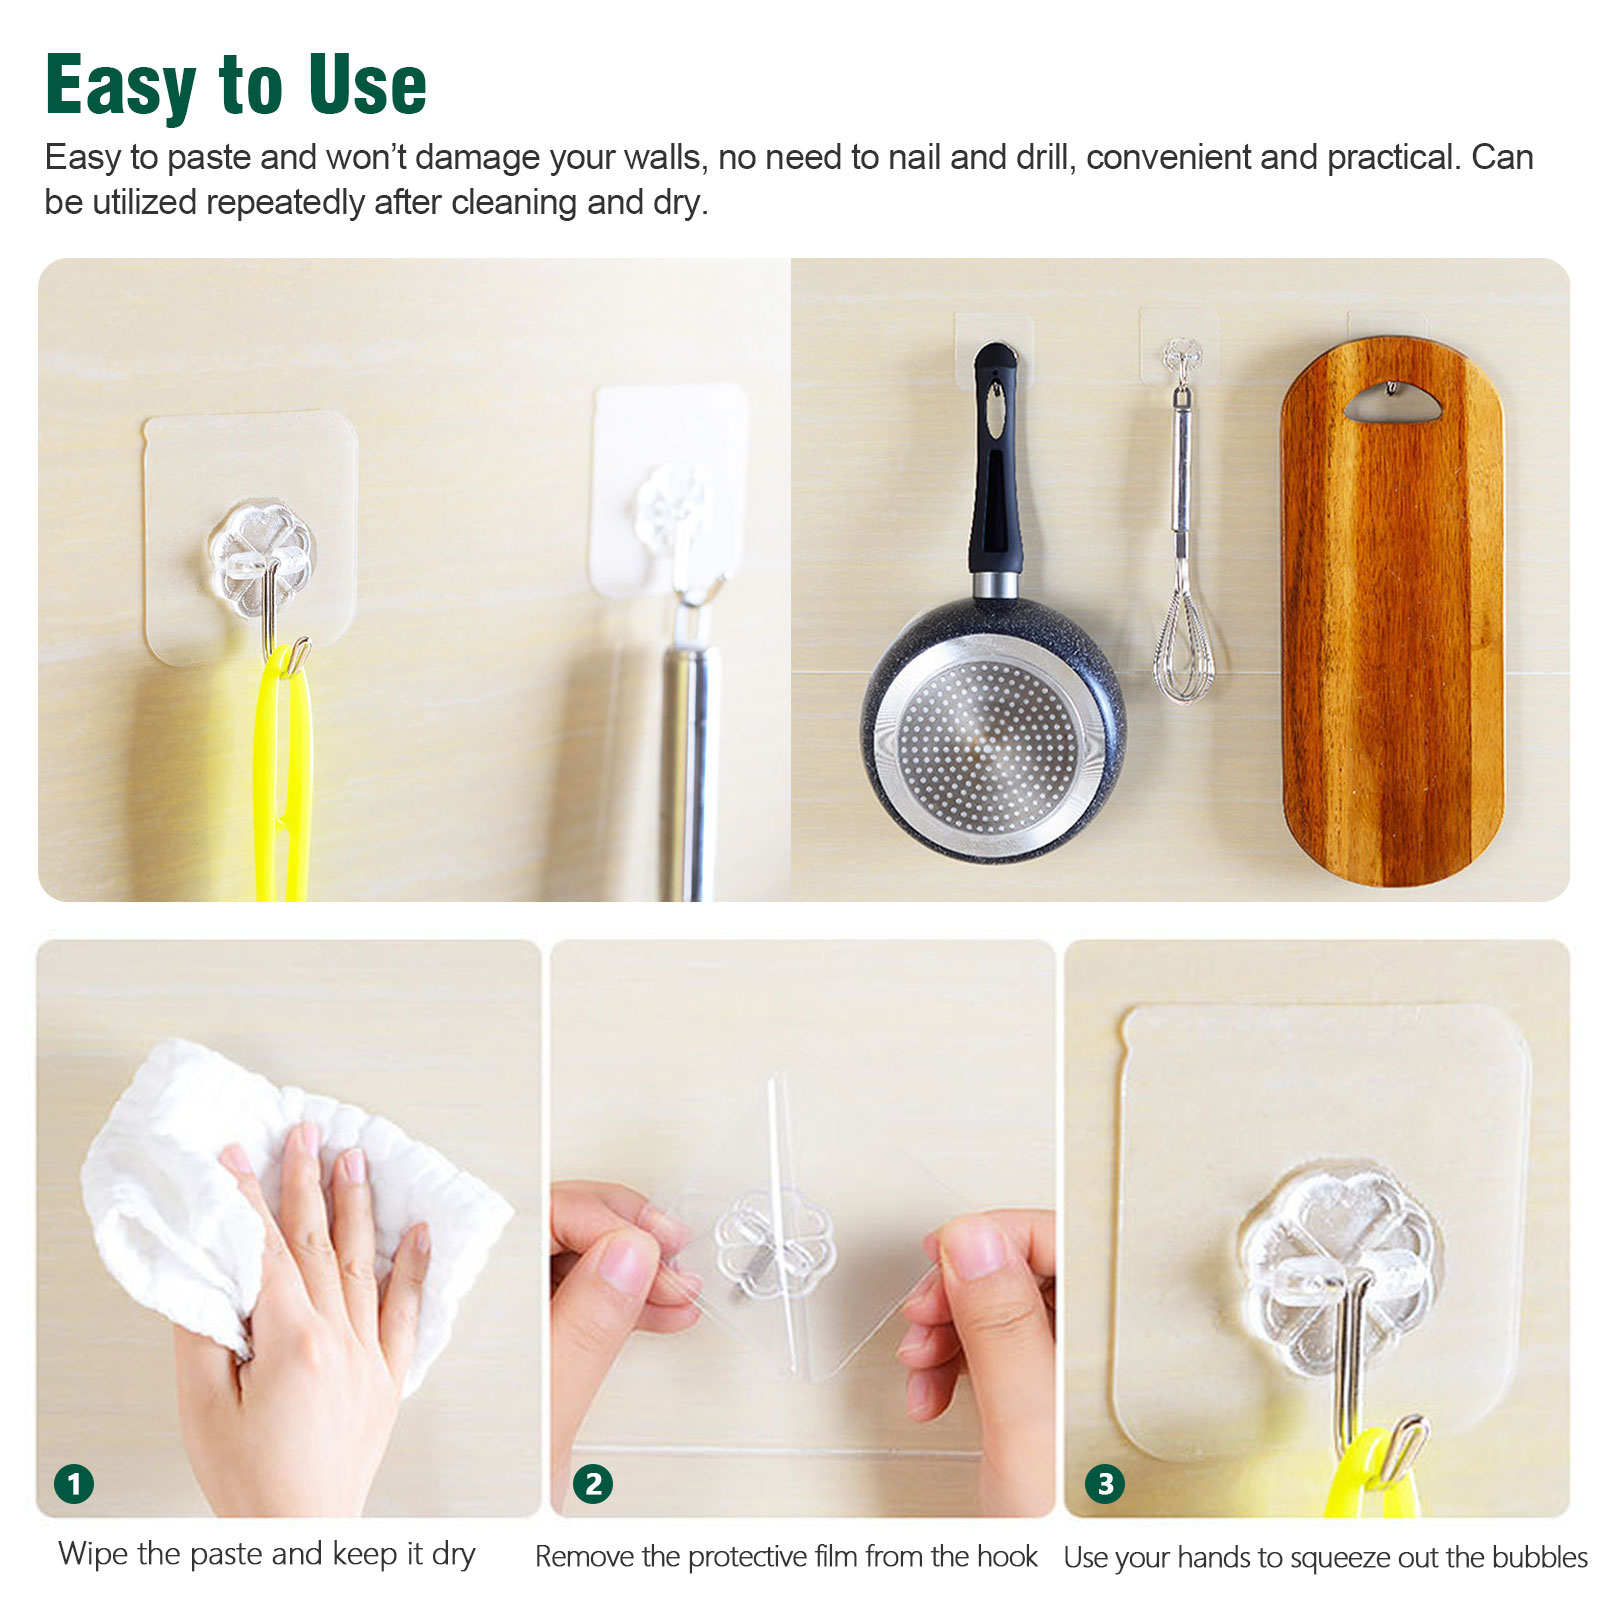 20-40x-Adhesive-Sticky-Hooks-Heavy-Duty-Wall-Seamless-Hooks-Hangers-Transparent thumbnail 6